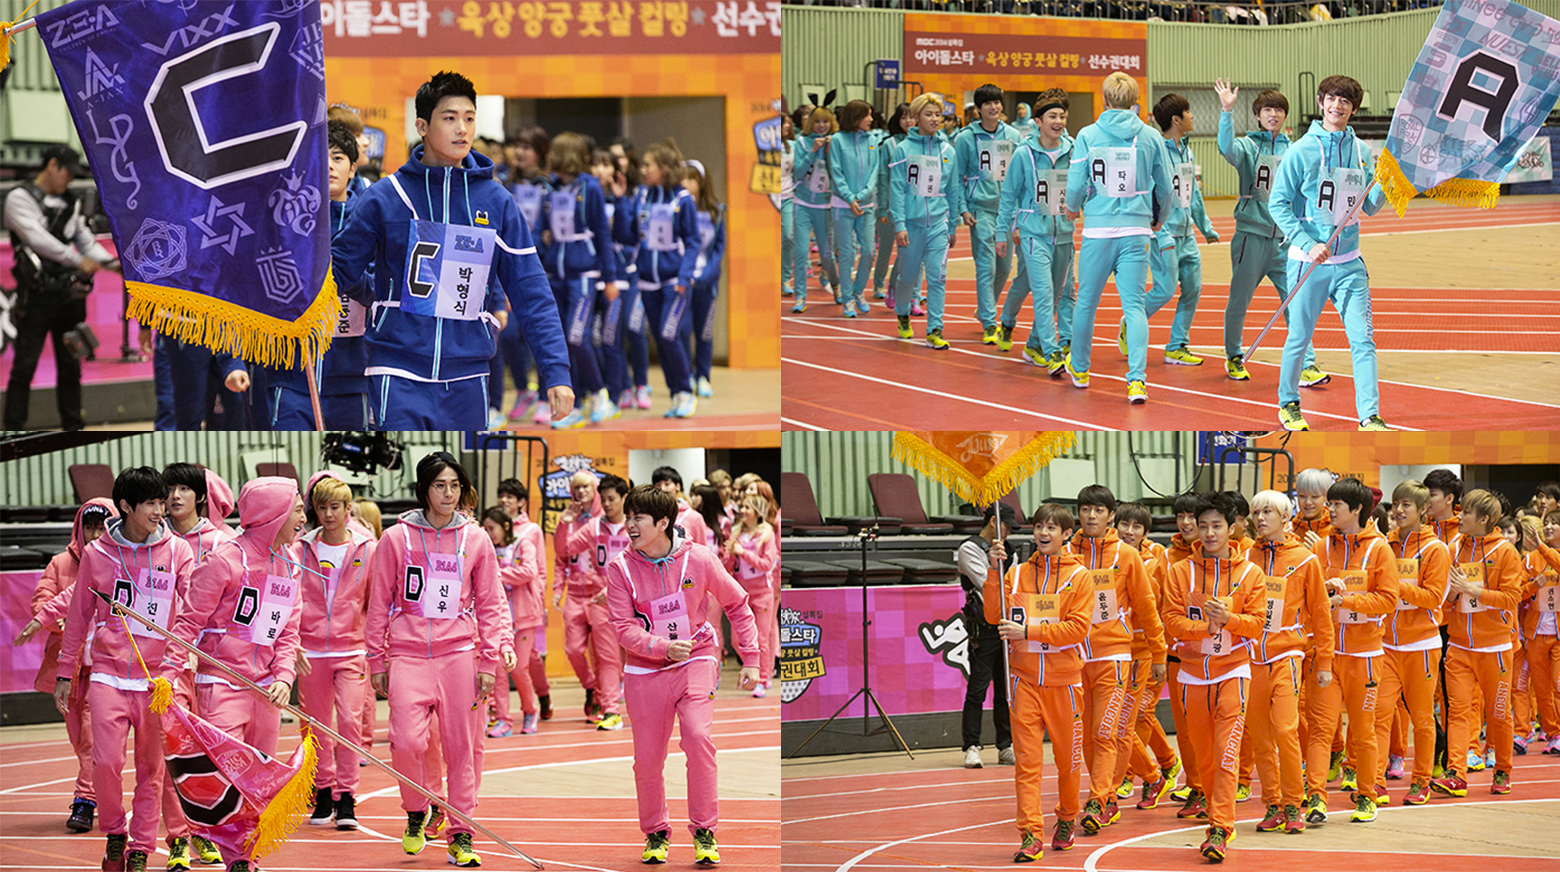 2014 Idol Star Athletics Championships - New Year Special